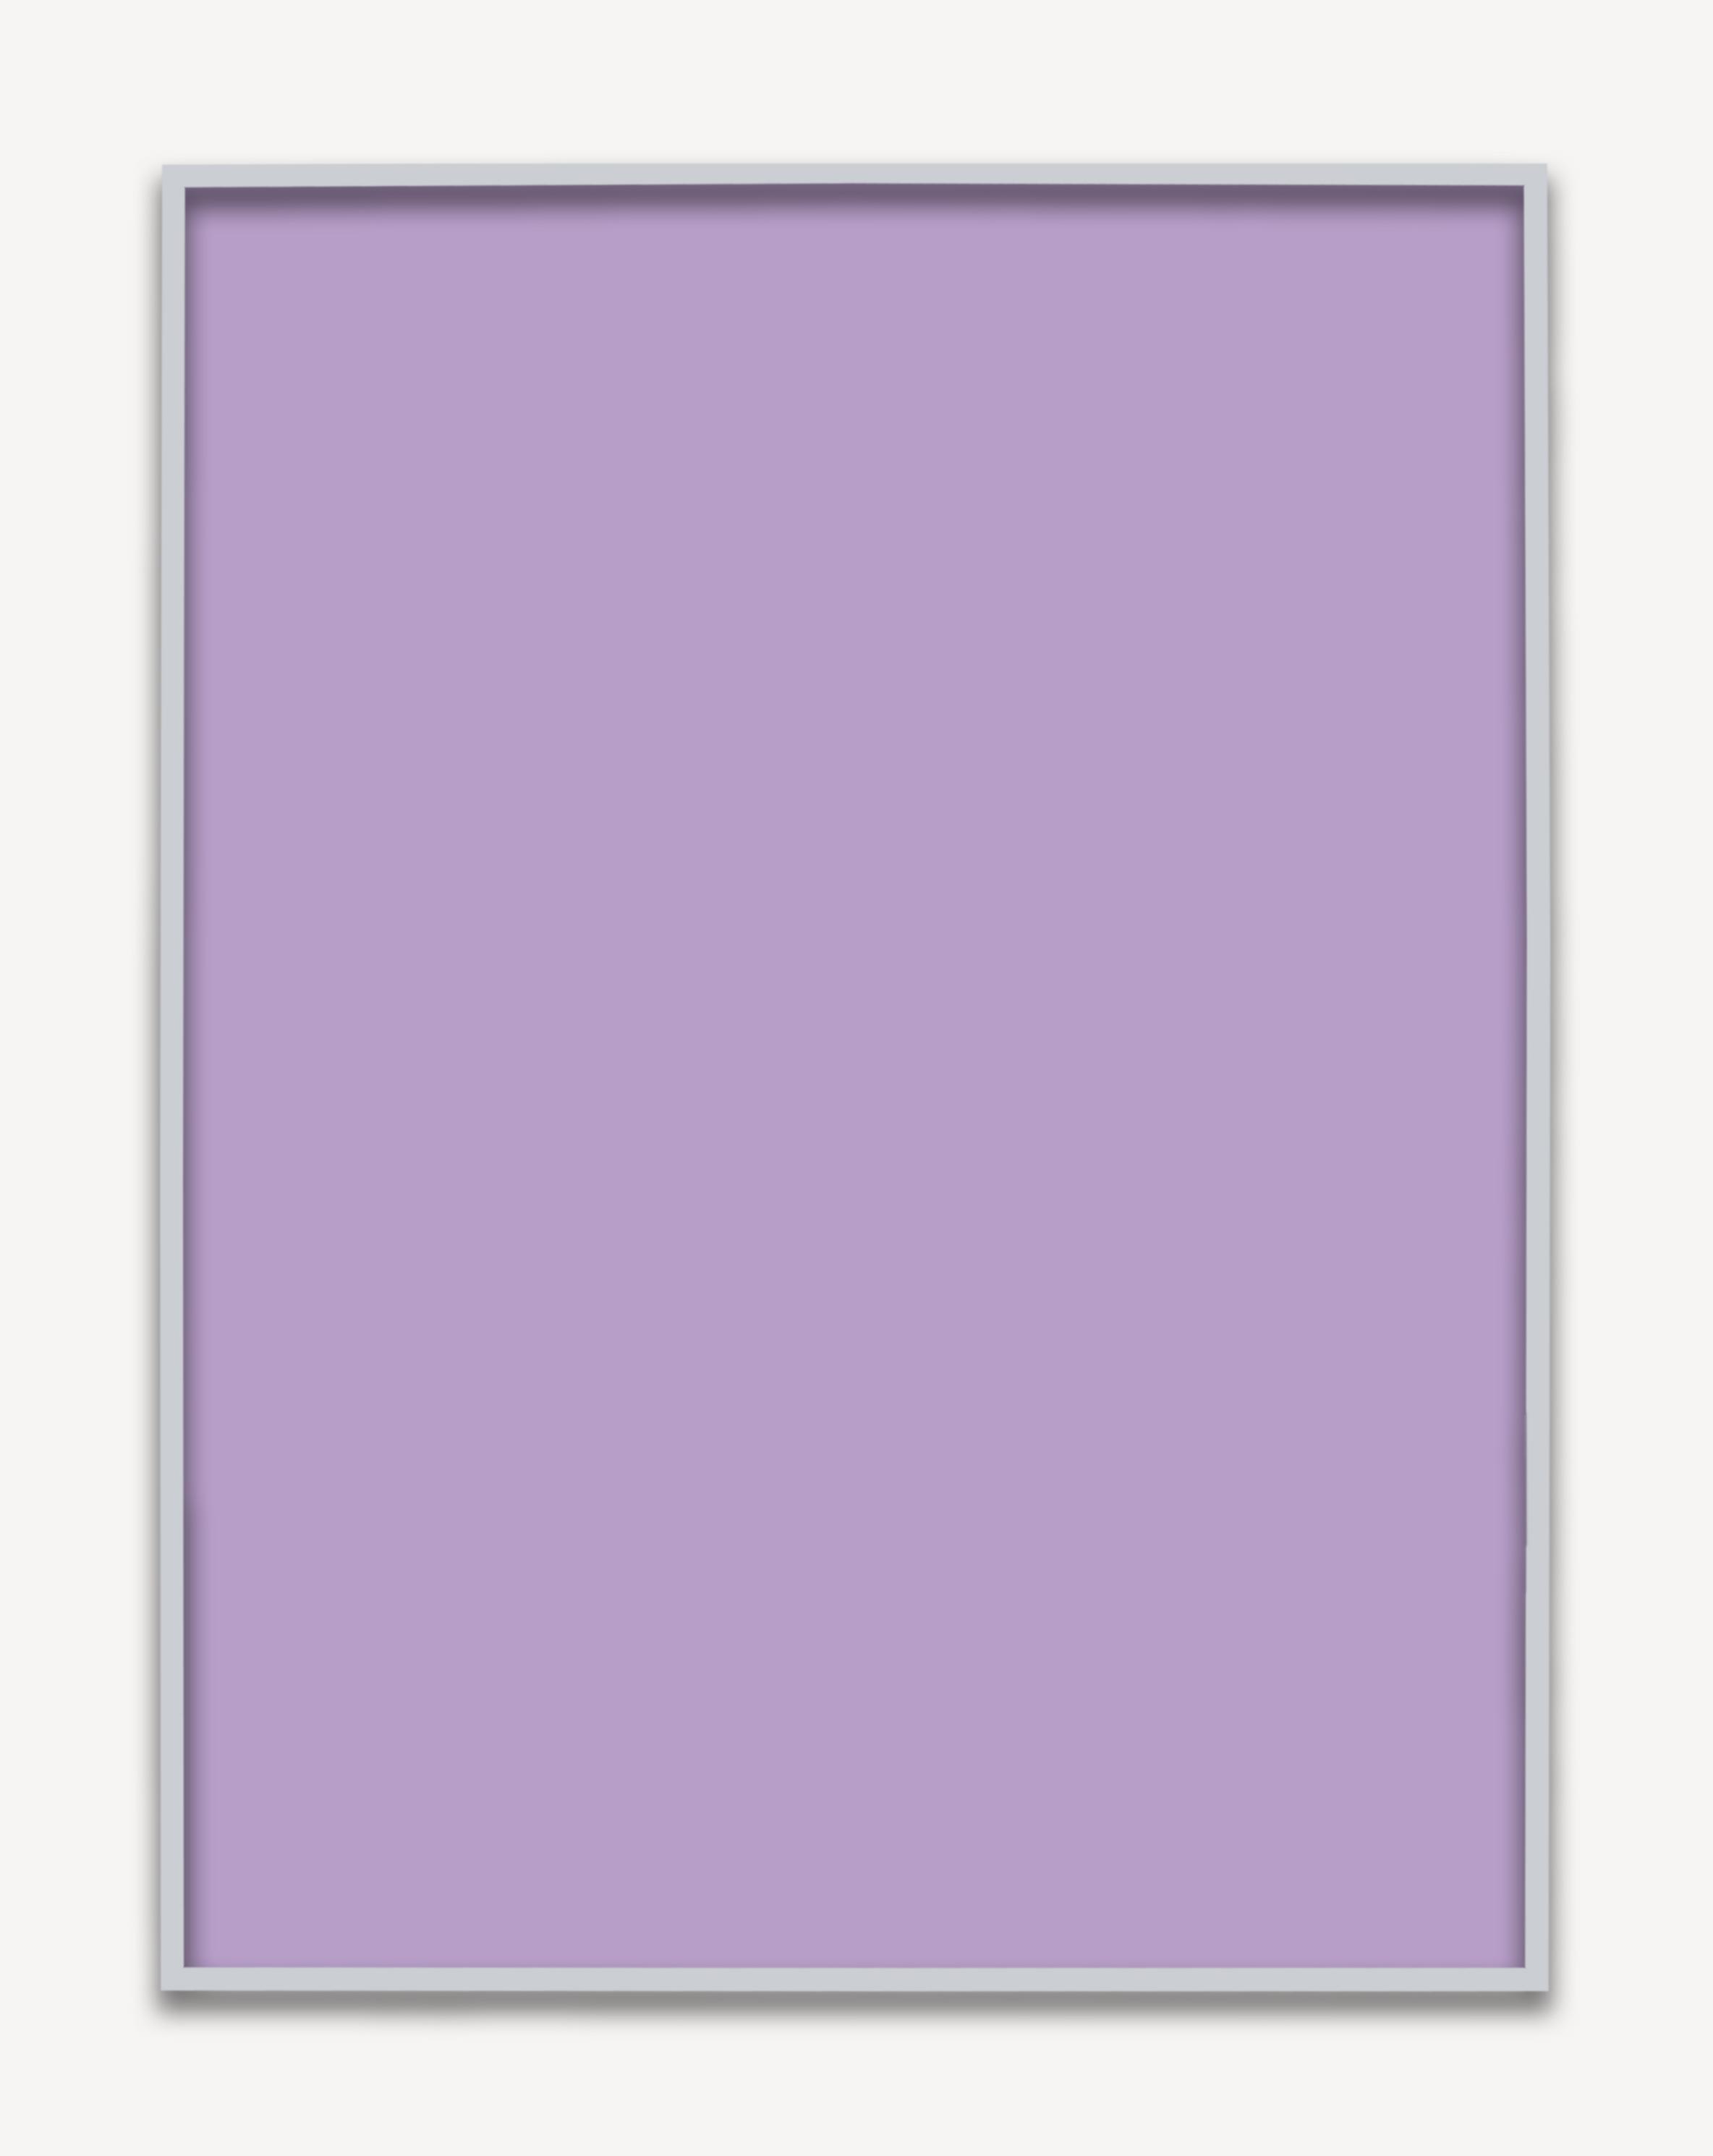 Untitled (Purple Monochrome 03), 2015 unique chromogenic print 153,5 x 123,5 cm - 60 3/8 x 48 5/8 inches (framed)